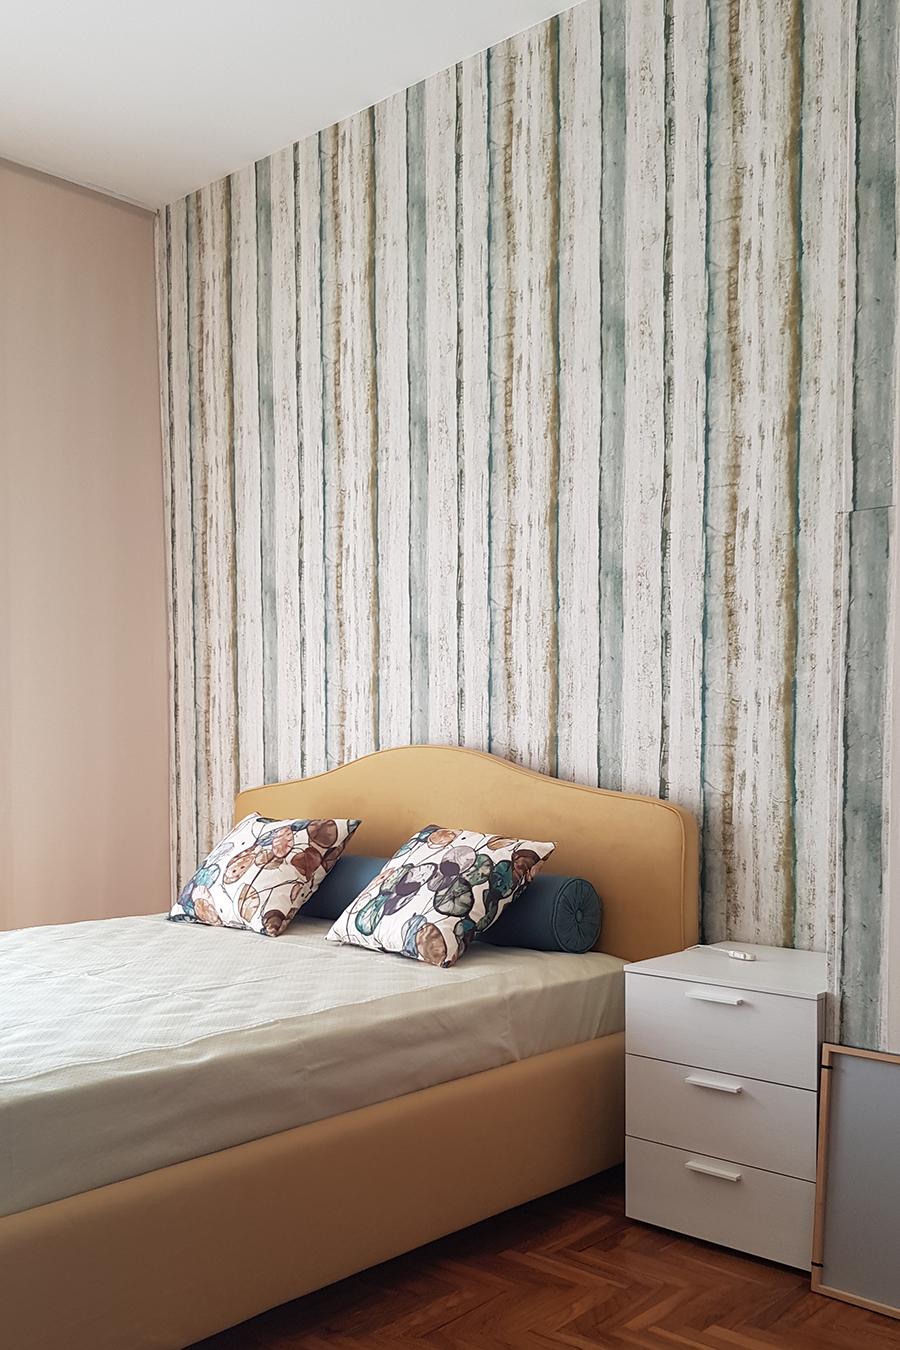 Vibo_wallpaper_casamance_kozo